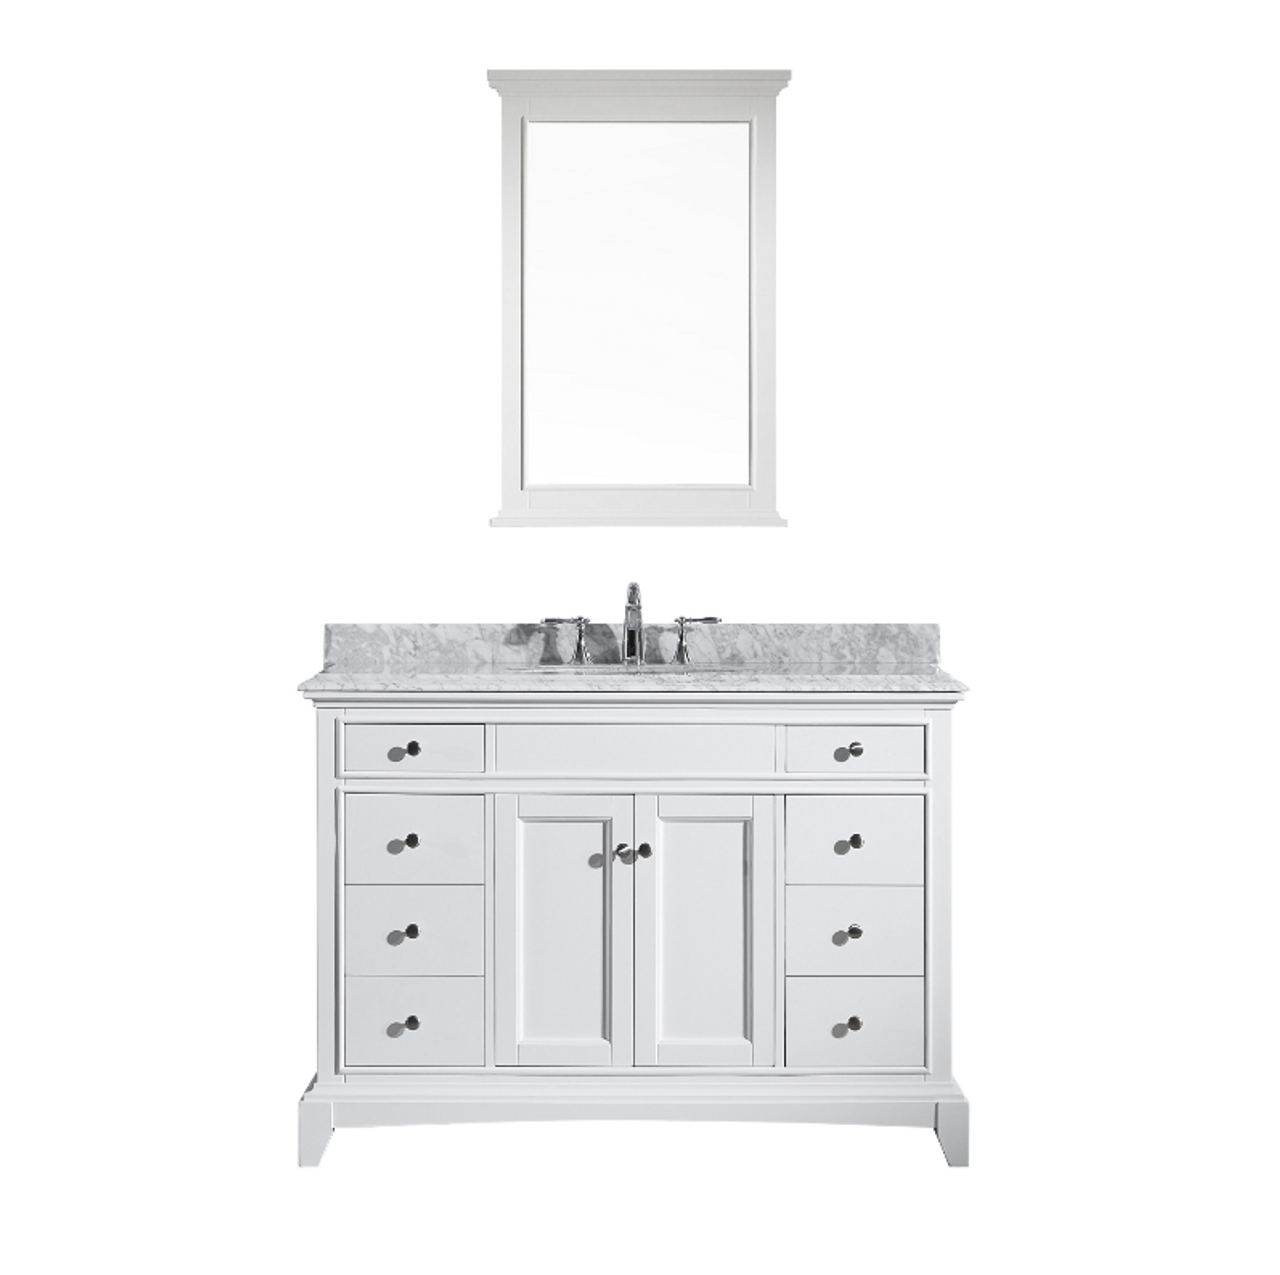 Royal Boca 48 Inch White Bathroom Vanity